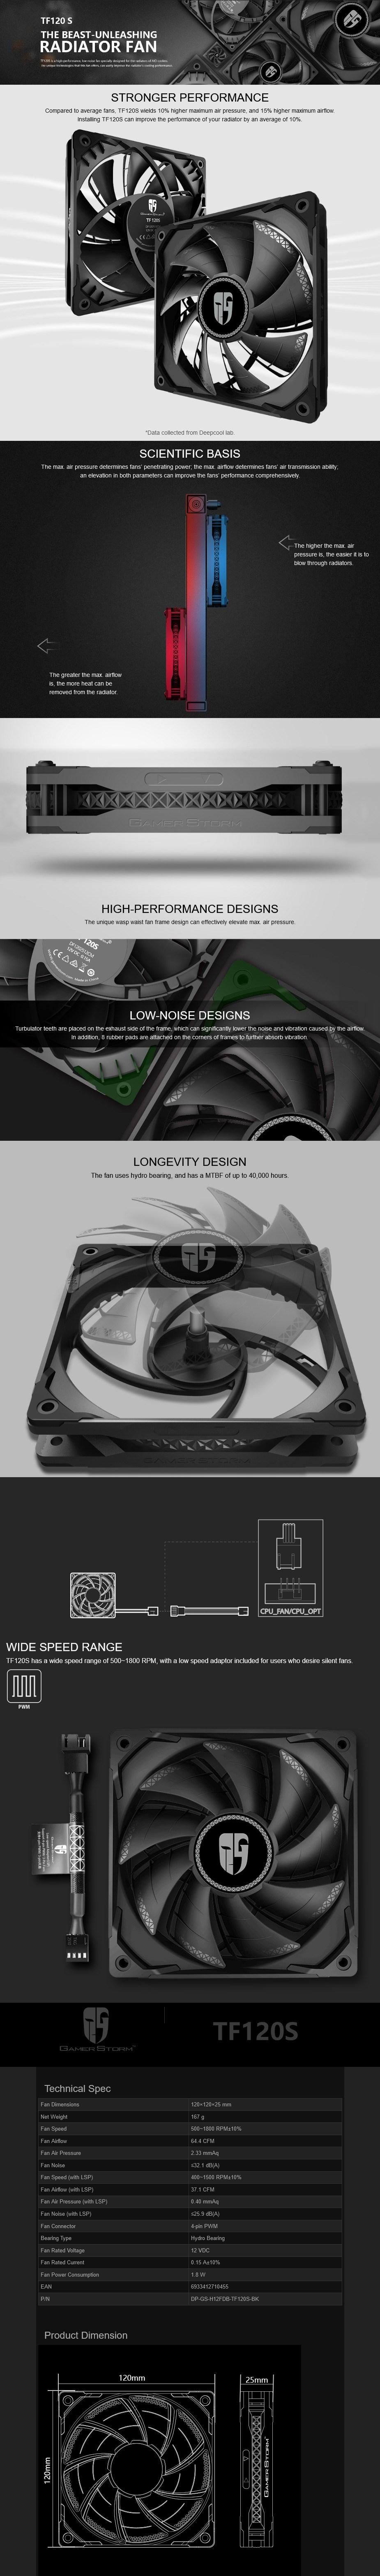 Deepcool Gamer Storm TF120 S 120mm 1800RPM Radiator Fan - Black - Overview 1